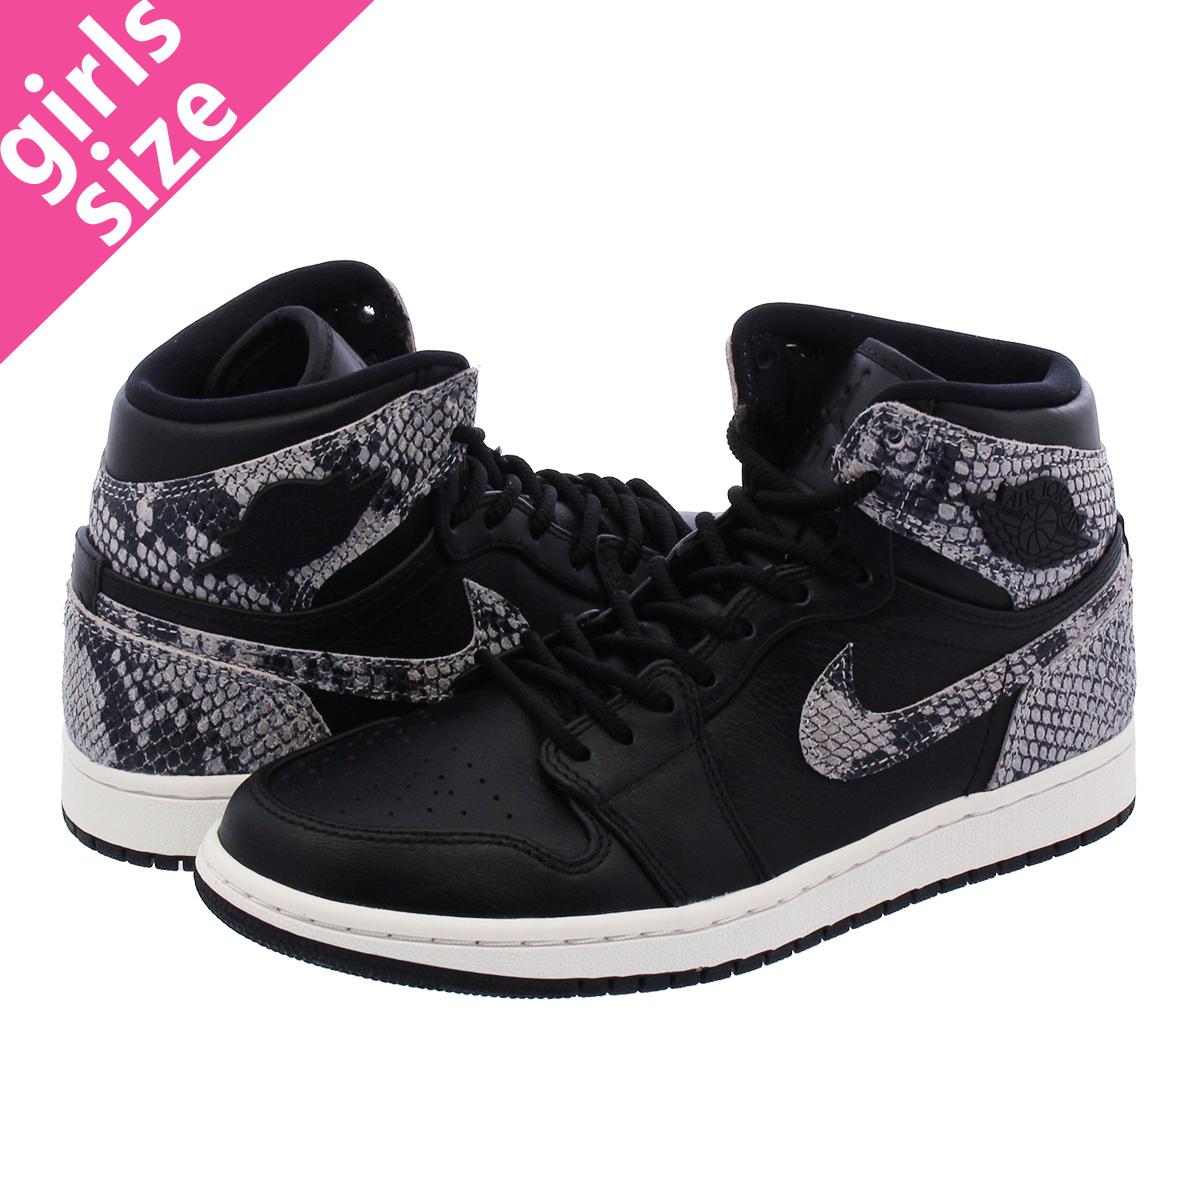 NIKE WMNS AIR JORDAN 1 RETRO HI PREM Nike women Air Jordan 1 nostalgic high  premium BLACK PHANTOM ah7389-014 232a6c7a1